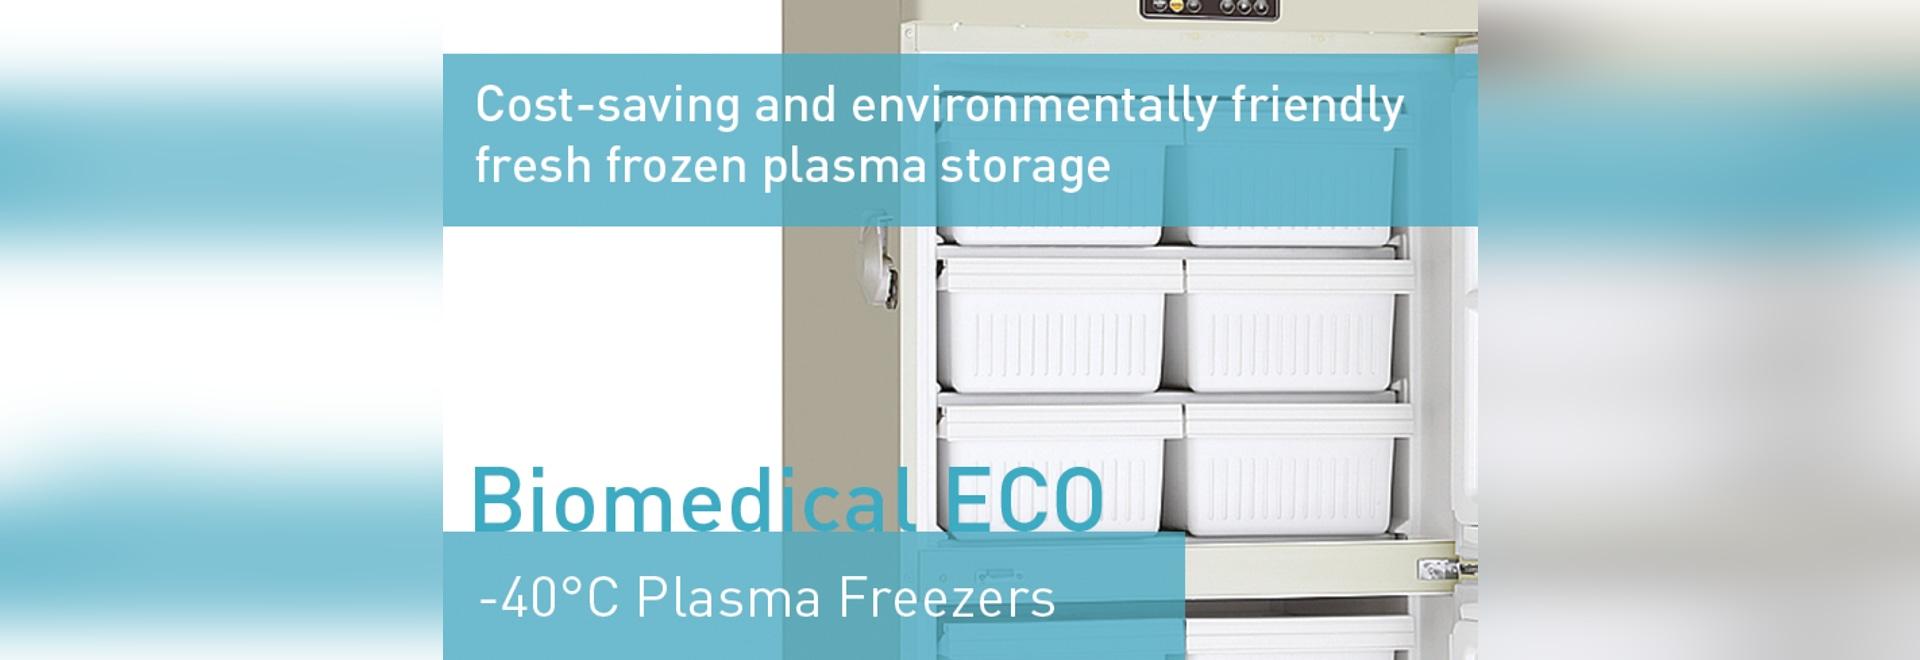 Biomedical ECO -40°C Plasma Freezers